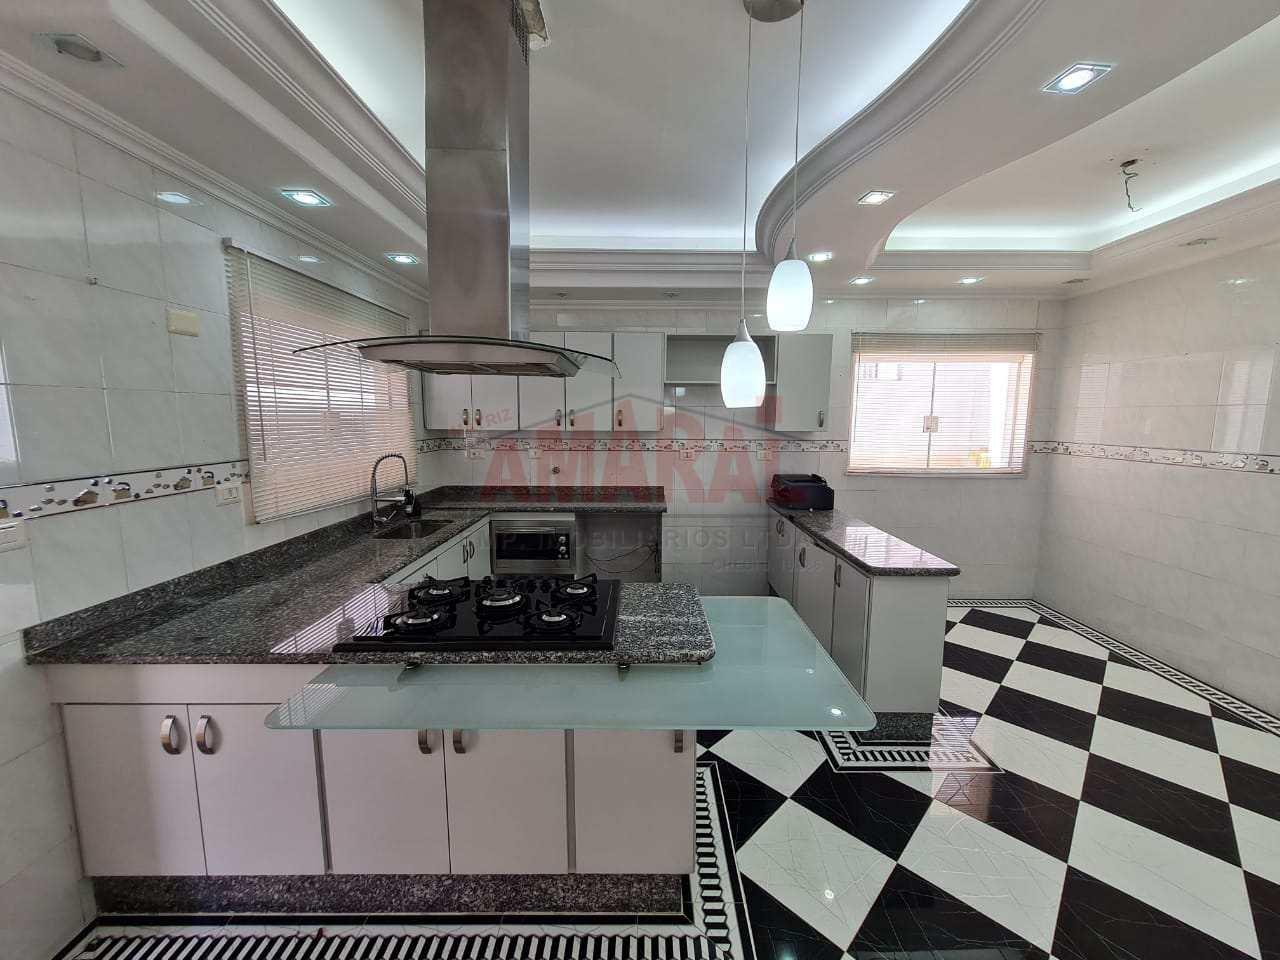 Sobrado com 4 dorms, Cidade Satélite Santa Bárbara, São Paulo - R$ 950 mil, Cod: 11353